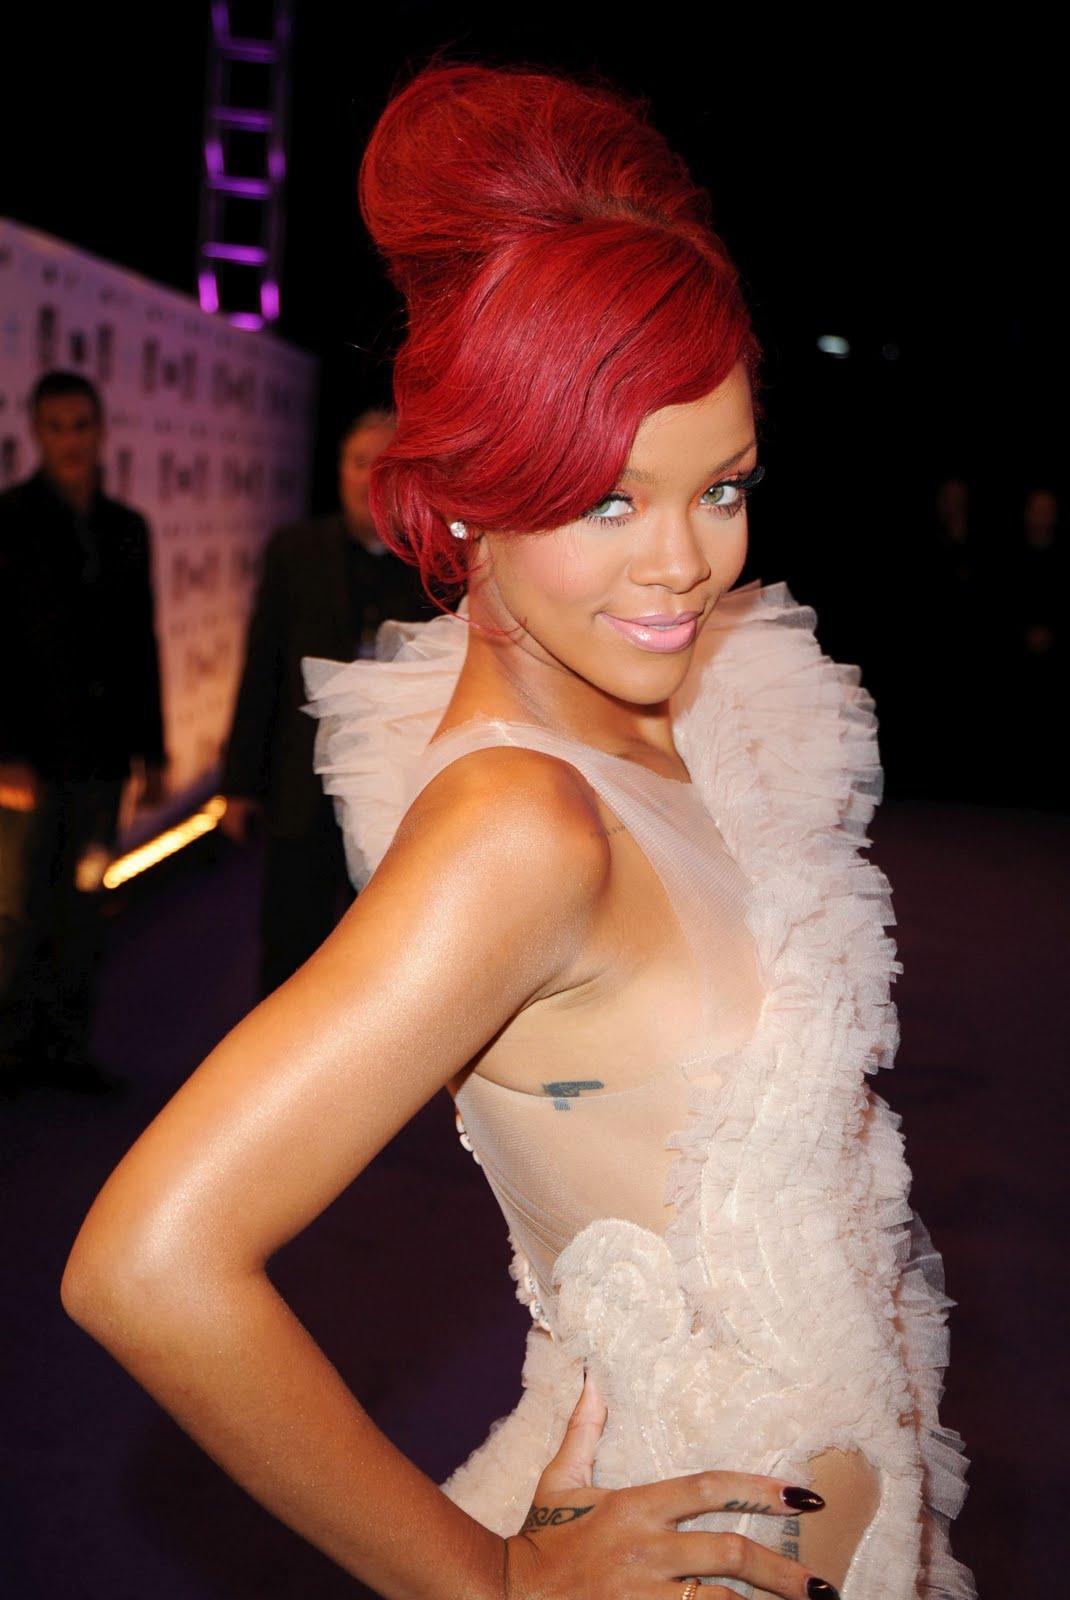 http://3.bp.blogspot.com/_ImioM_zH-NY/TNhk3RunwcI/AAAAAAAAAx0/6VT1xlLceN8/s1600/Rihanna-71.jpg